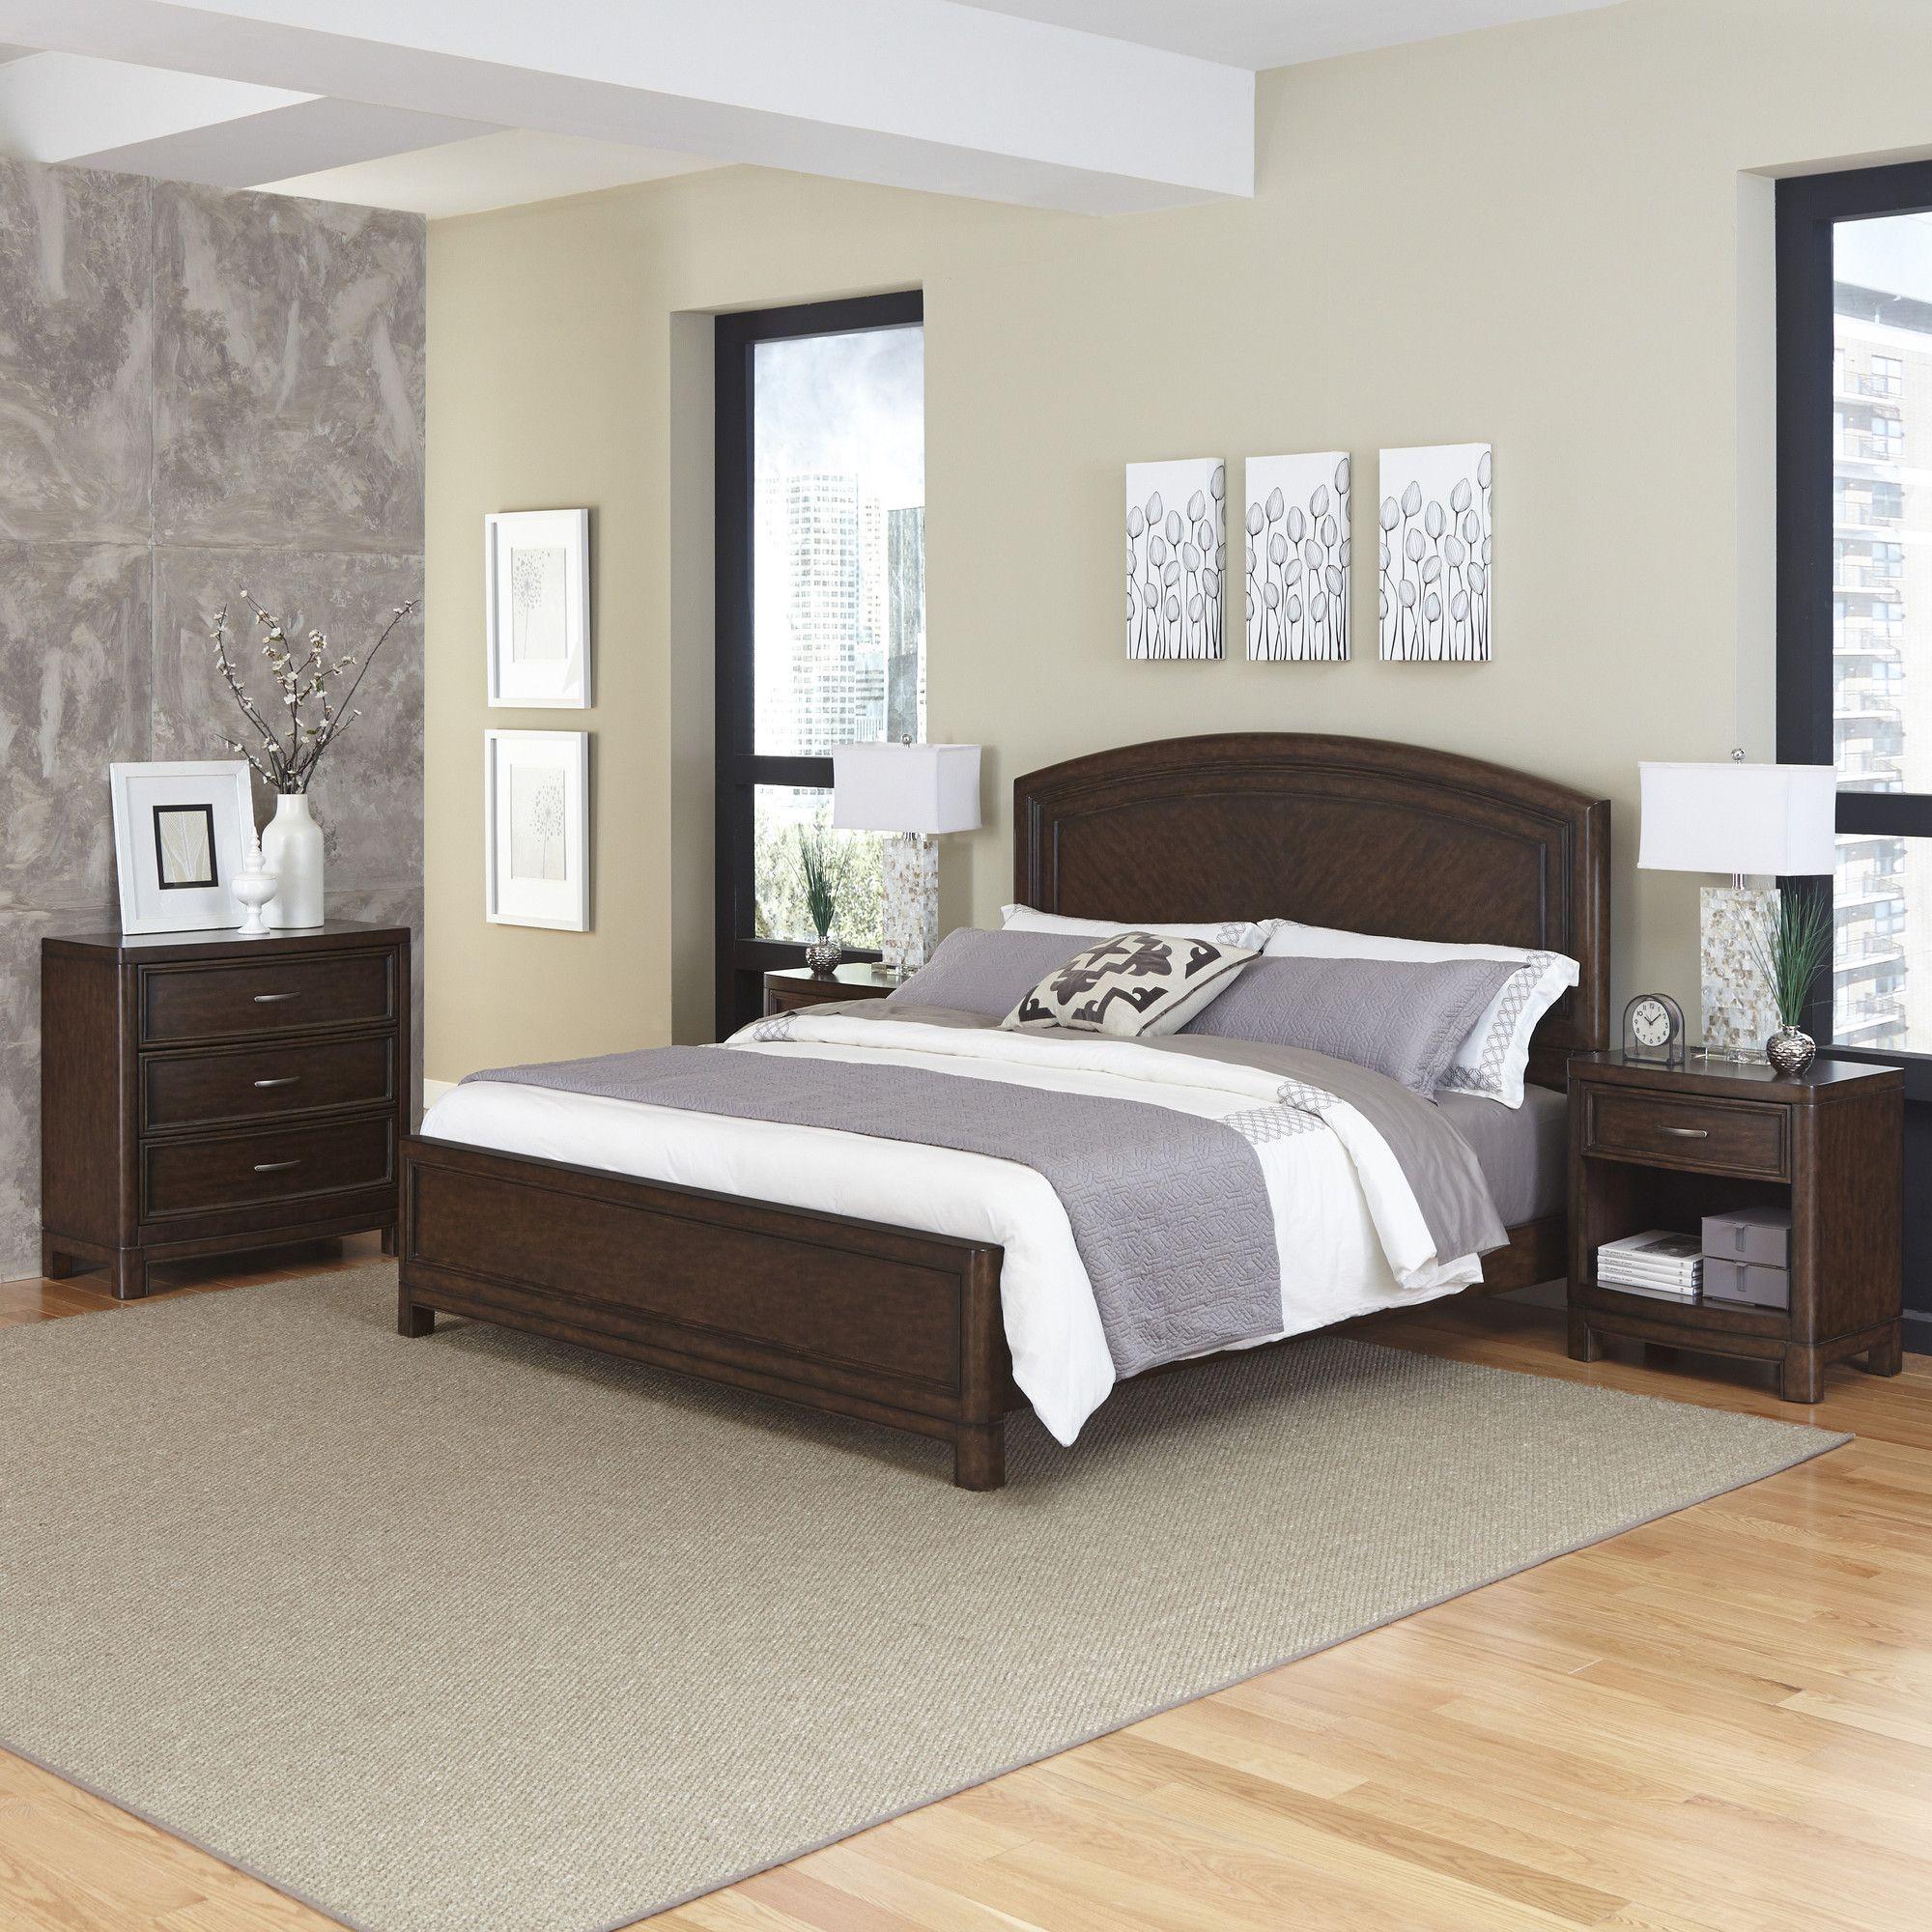 Crescent Hill Standard 3 Piece Bedroom Set Bedroom sets